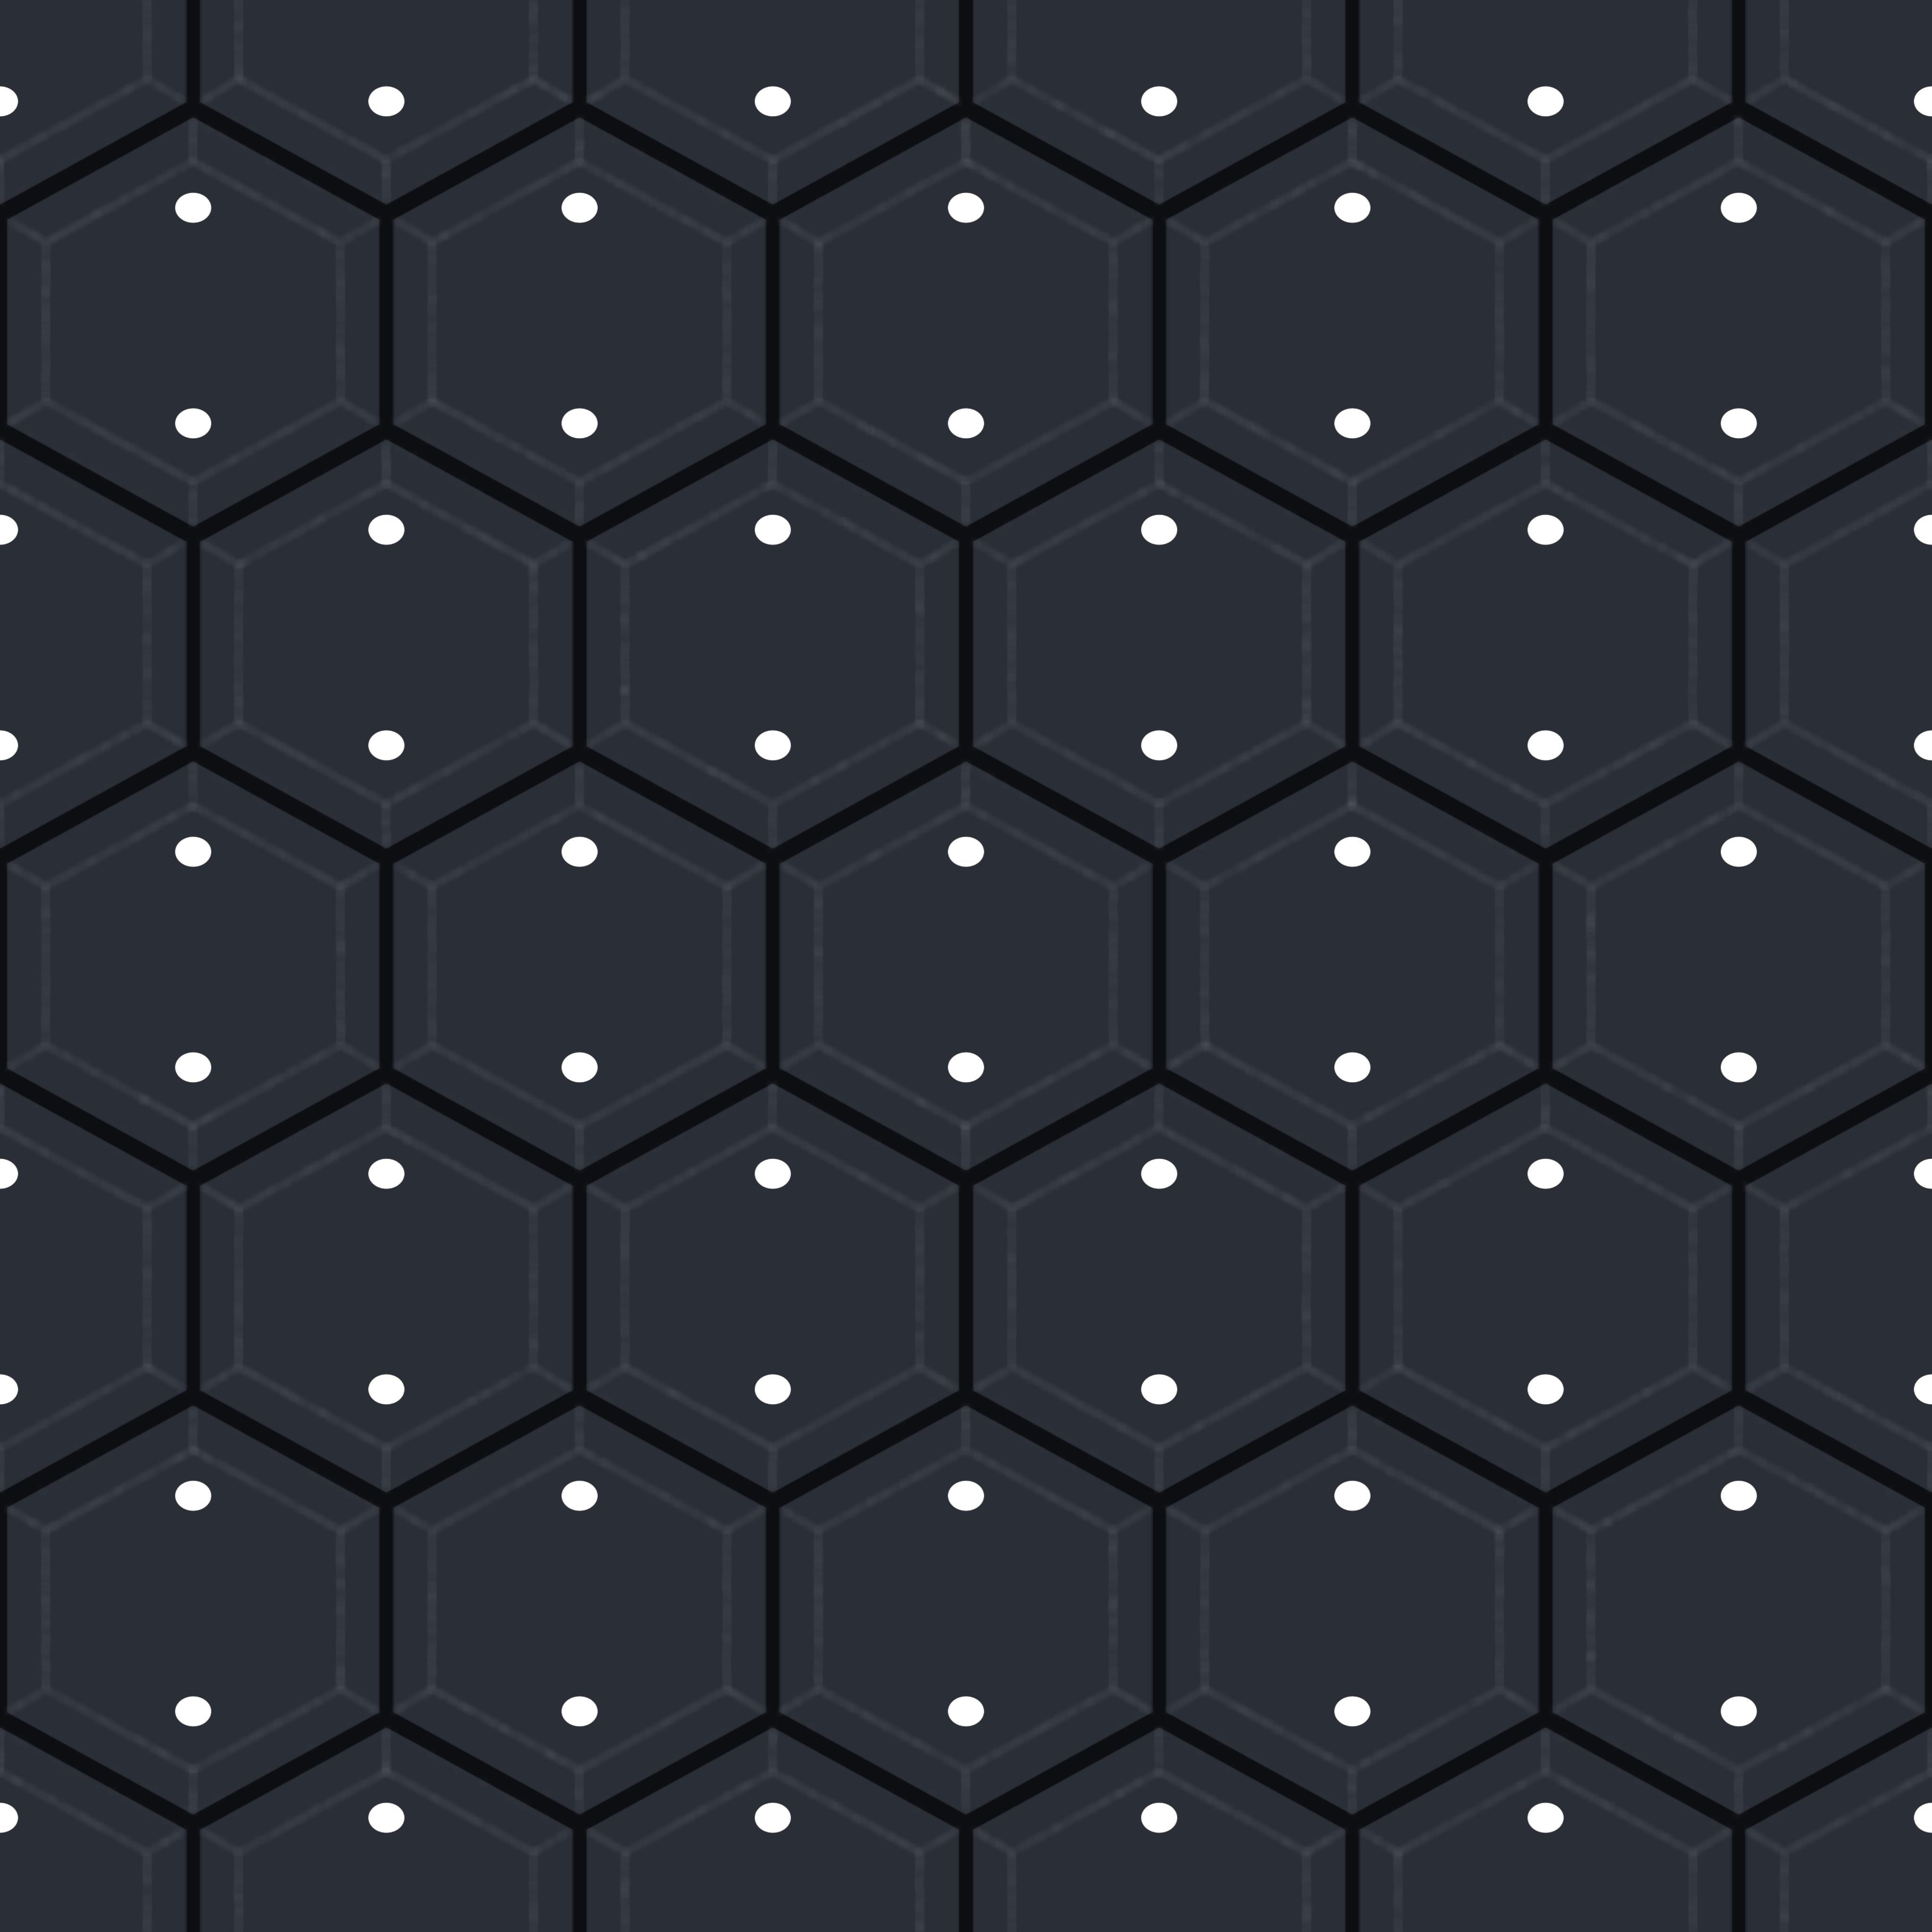 4096 Scifi Hex Tiles Pbr Texture Opengameart Org